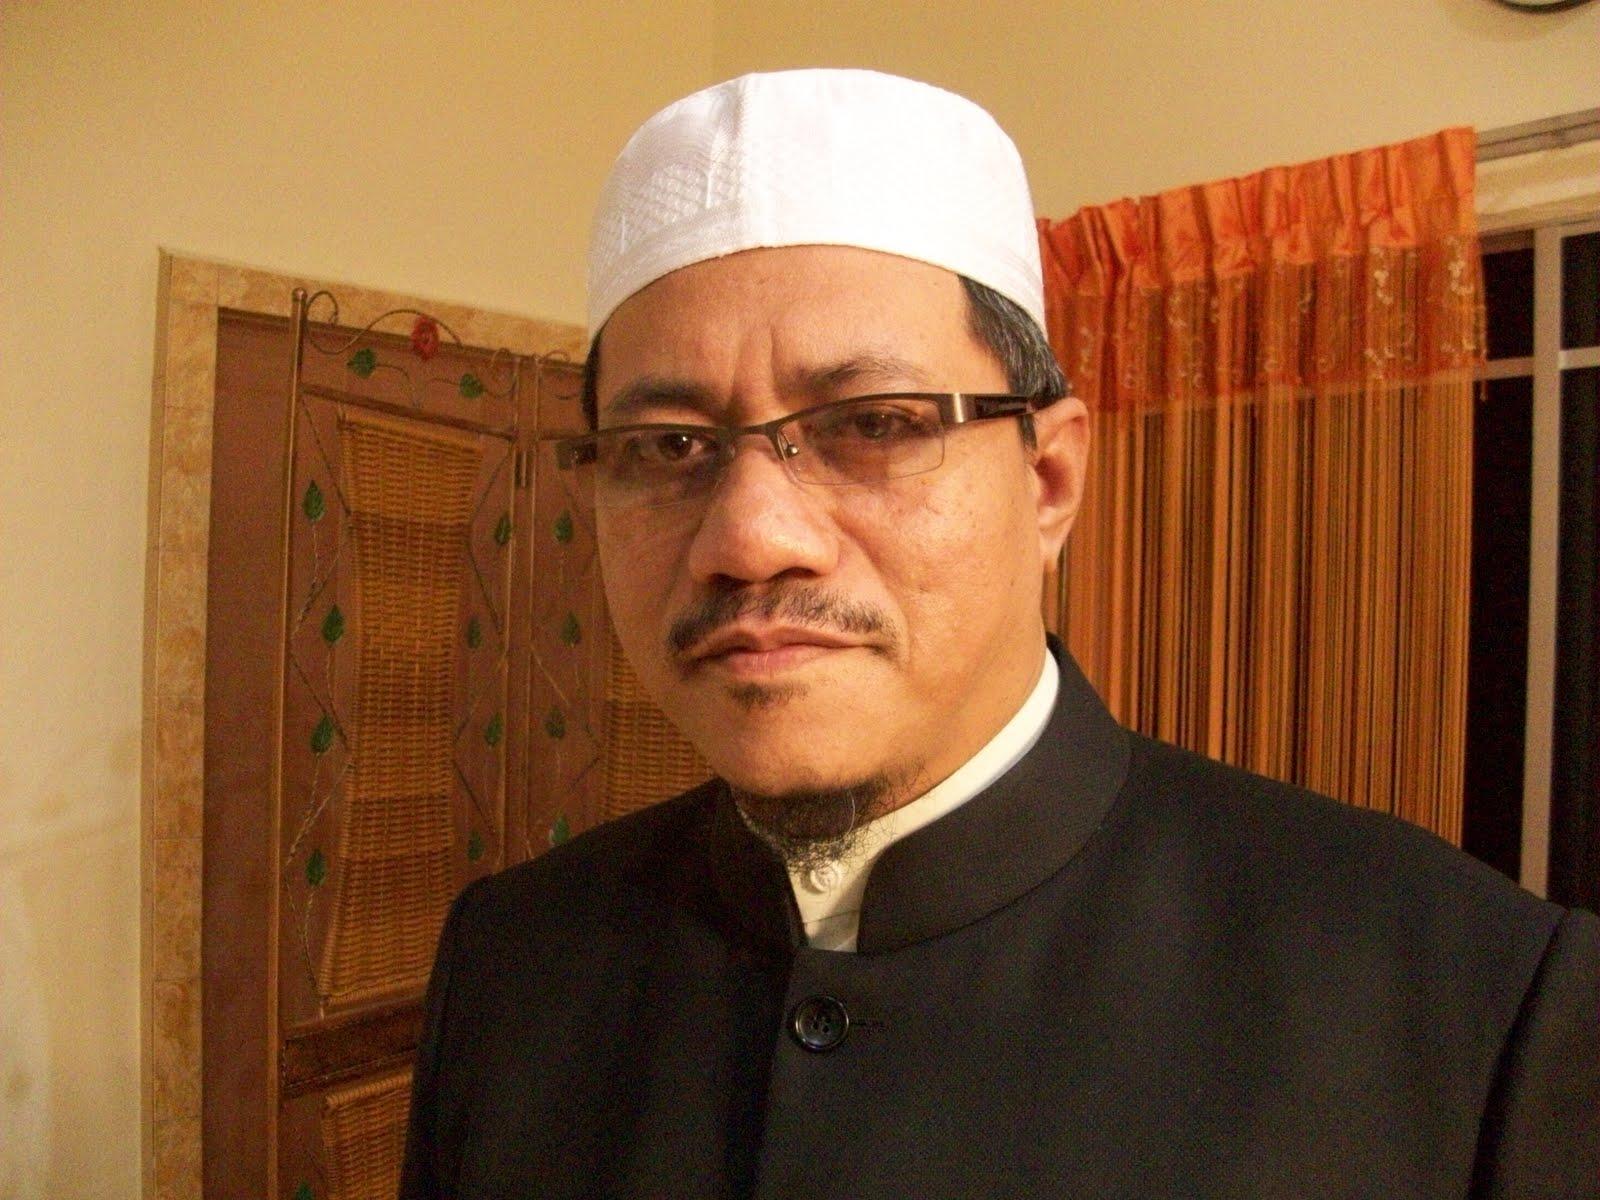 Dr. Abdul Basit Abdul Rahman Pondok Sungai Durian www.mymaktabaty.com